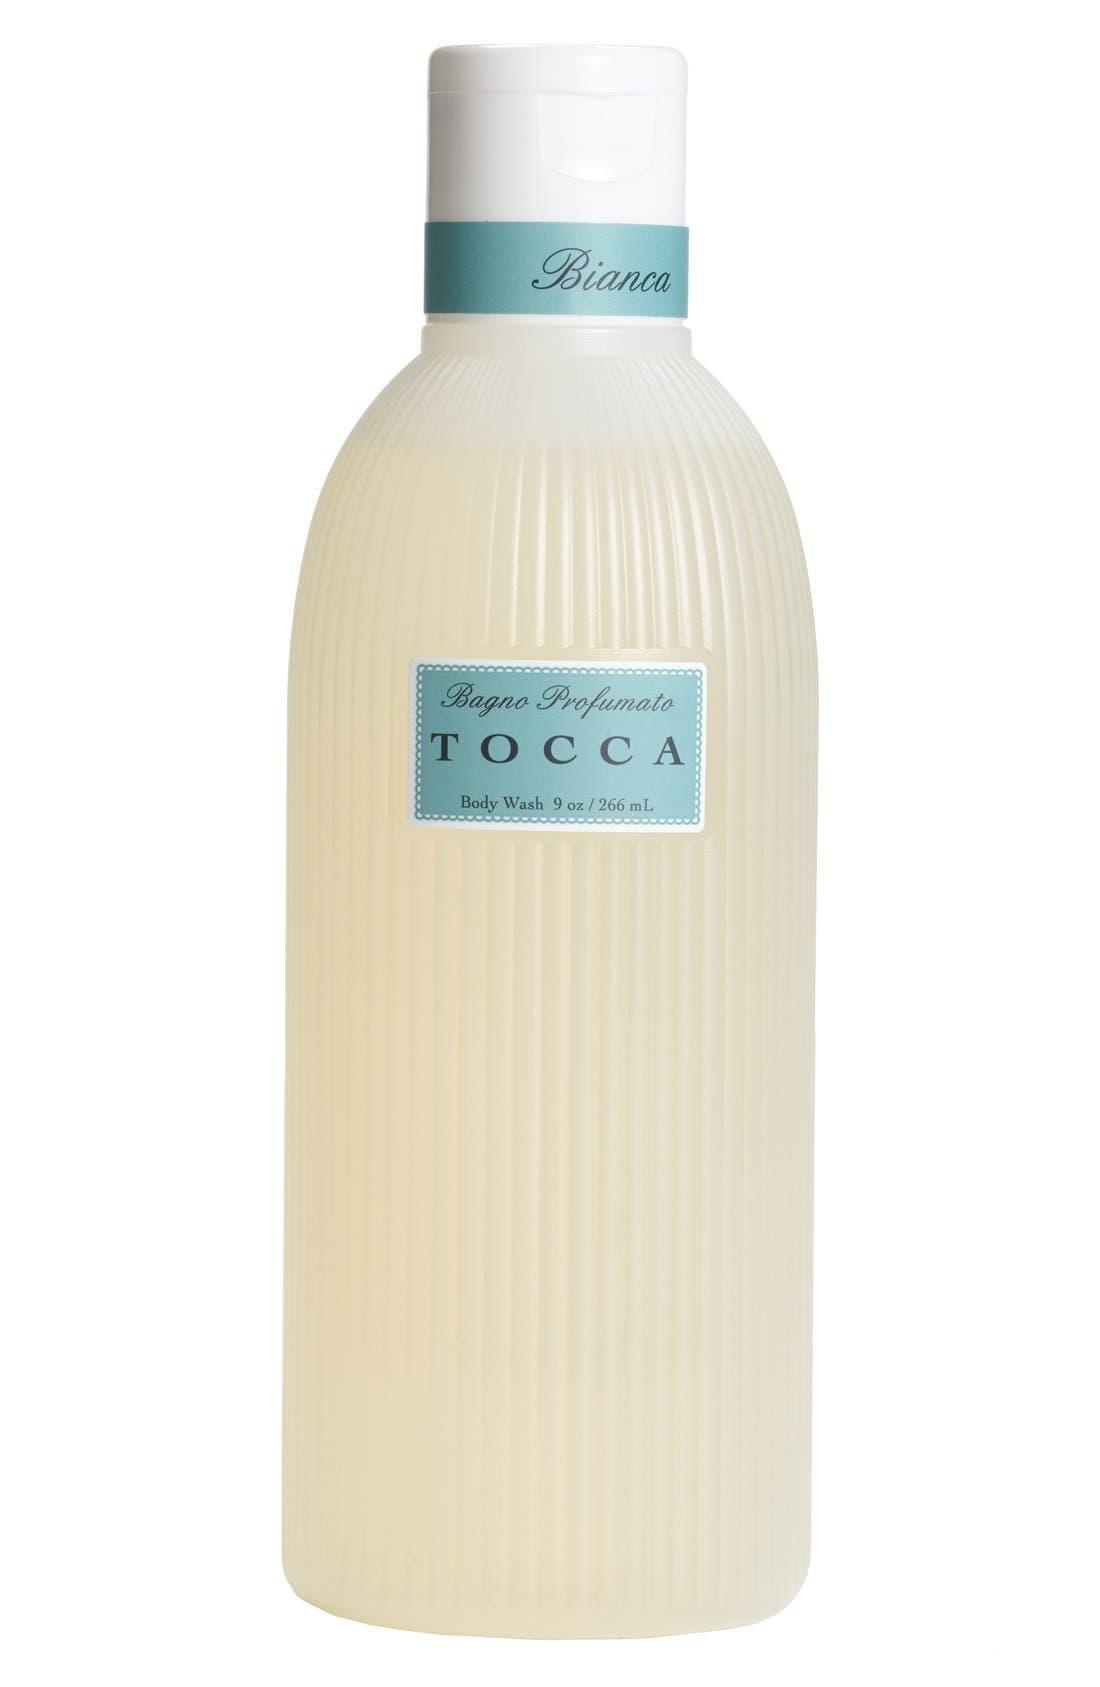 TOCCA 'Bianca' Body Wash